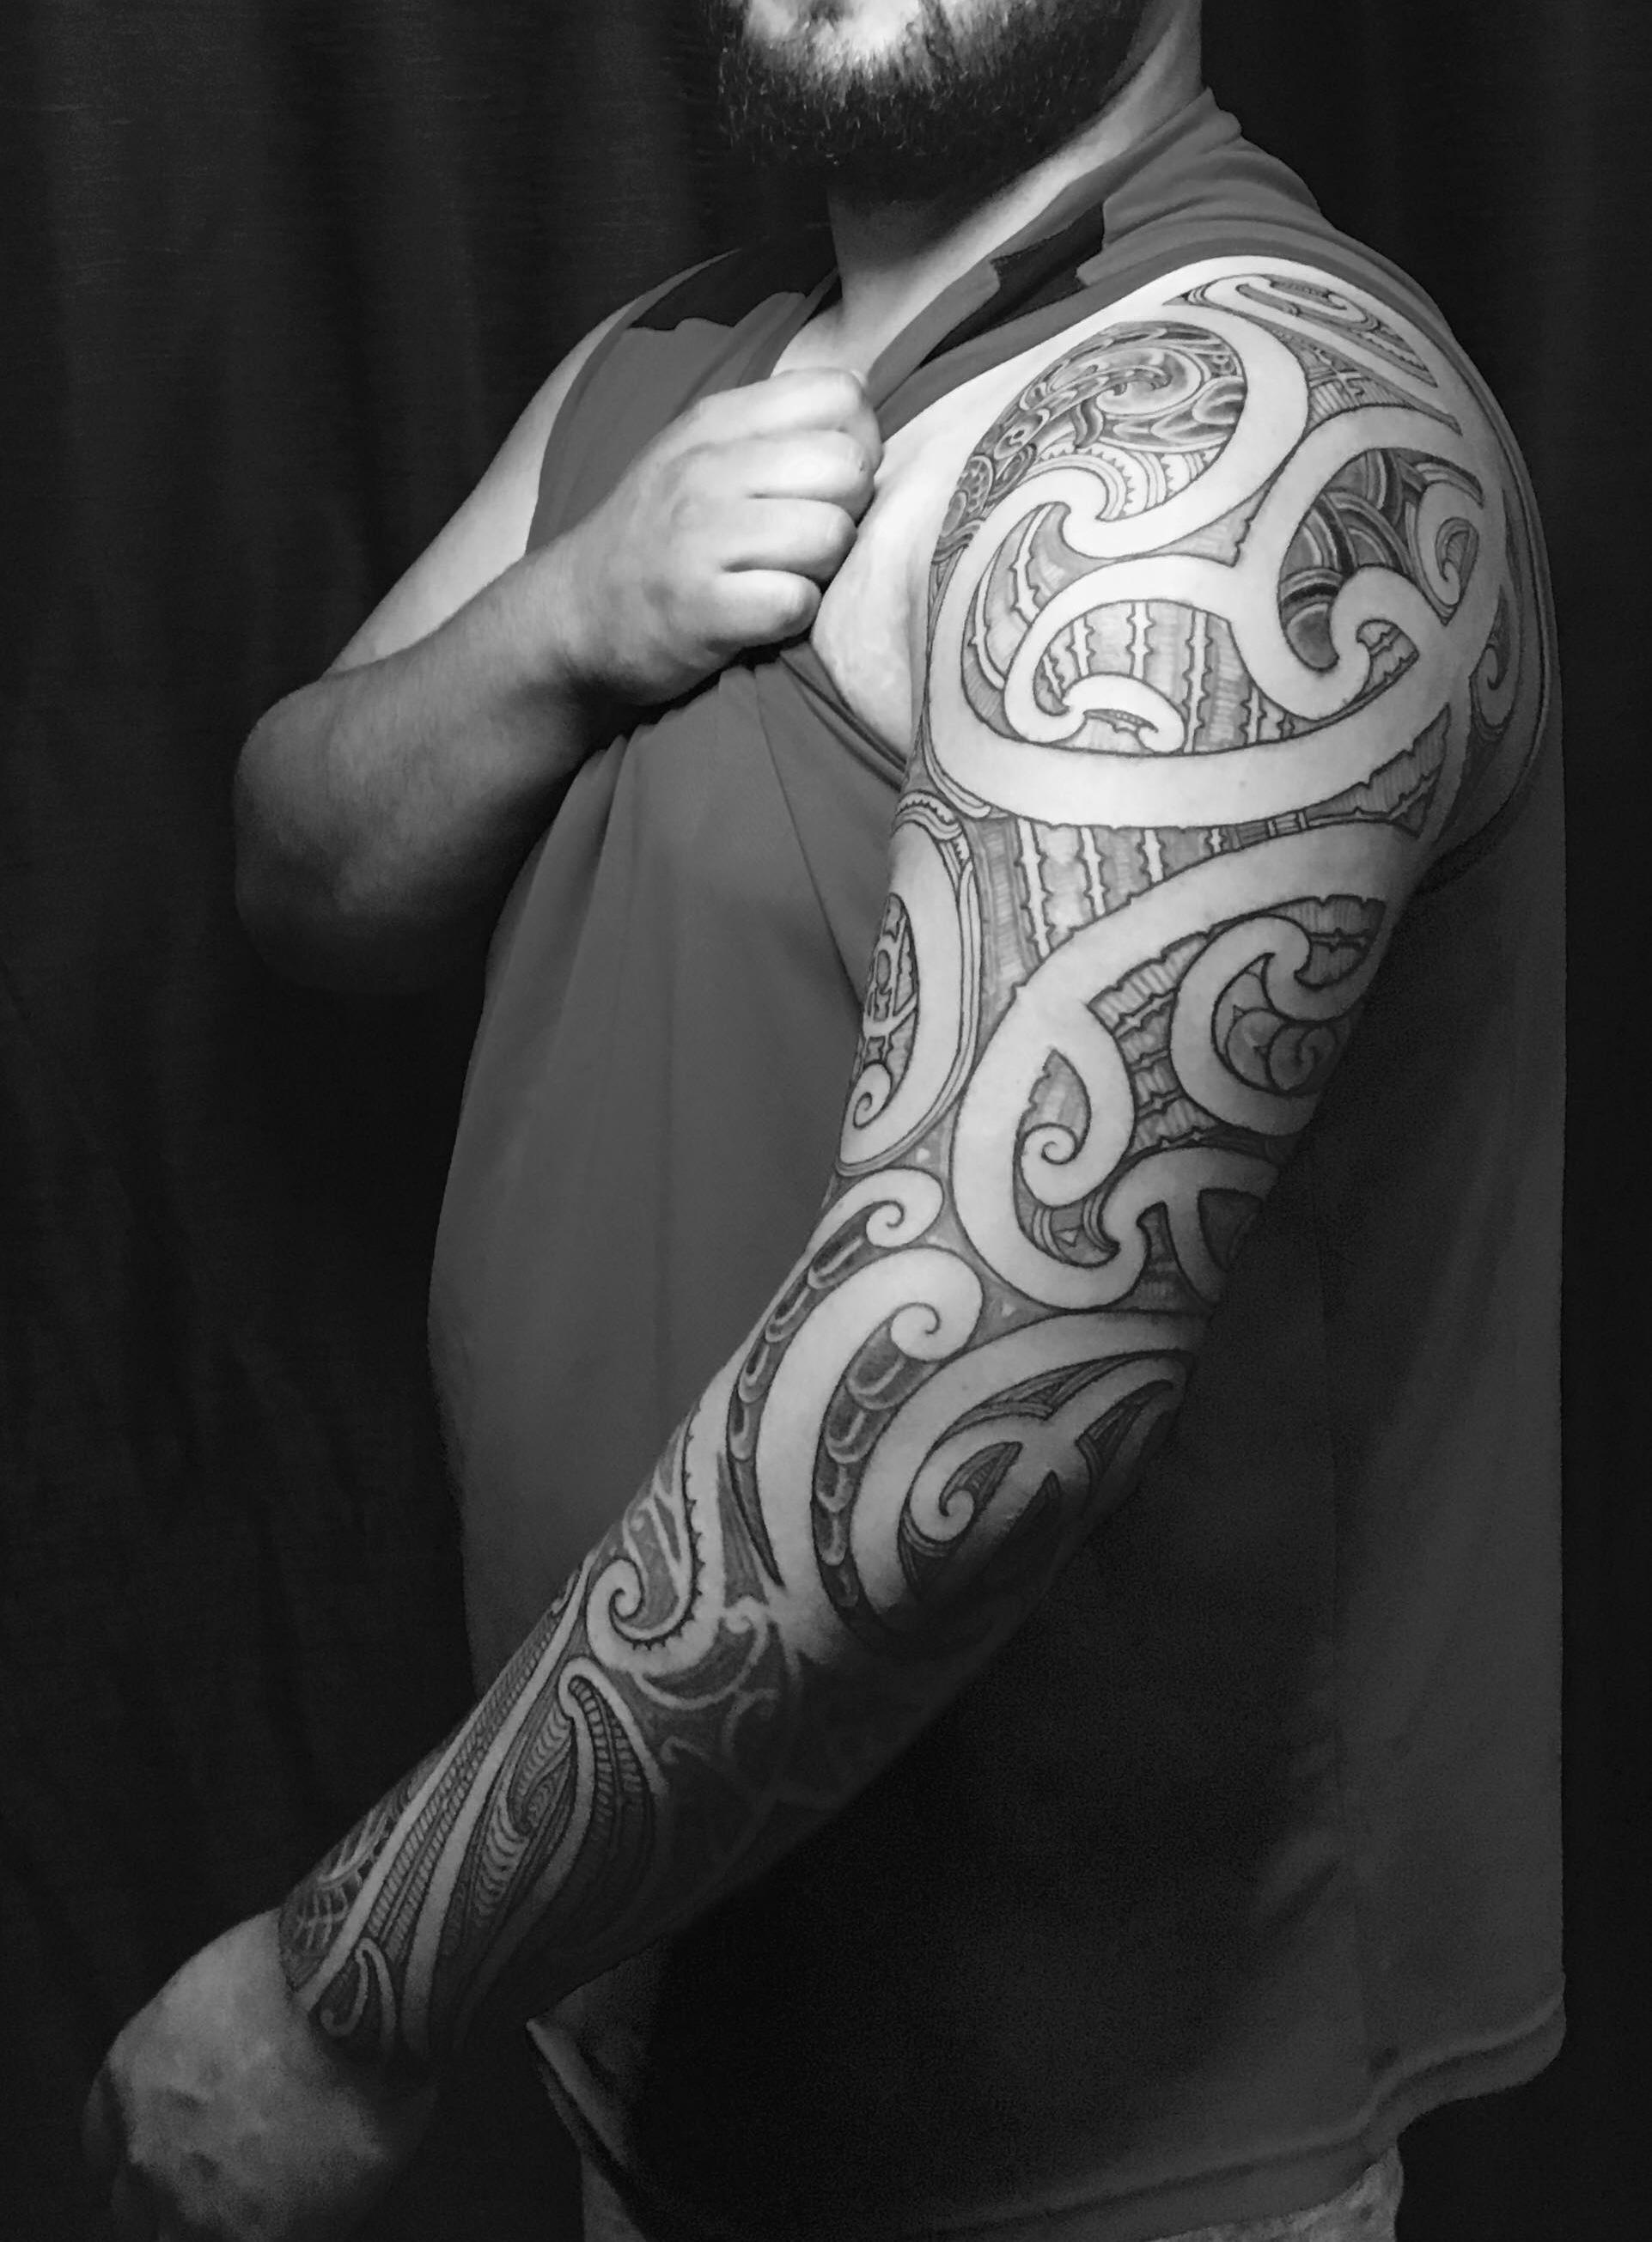 full-tamoko-sleeve-tattoo-nz.jpg